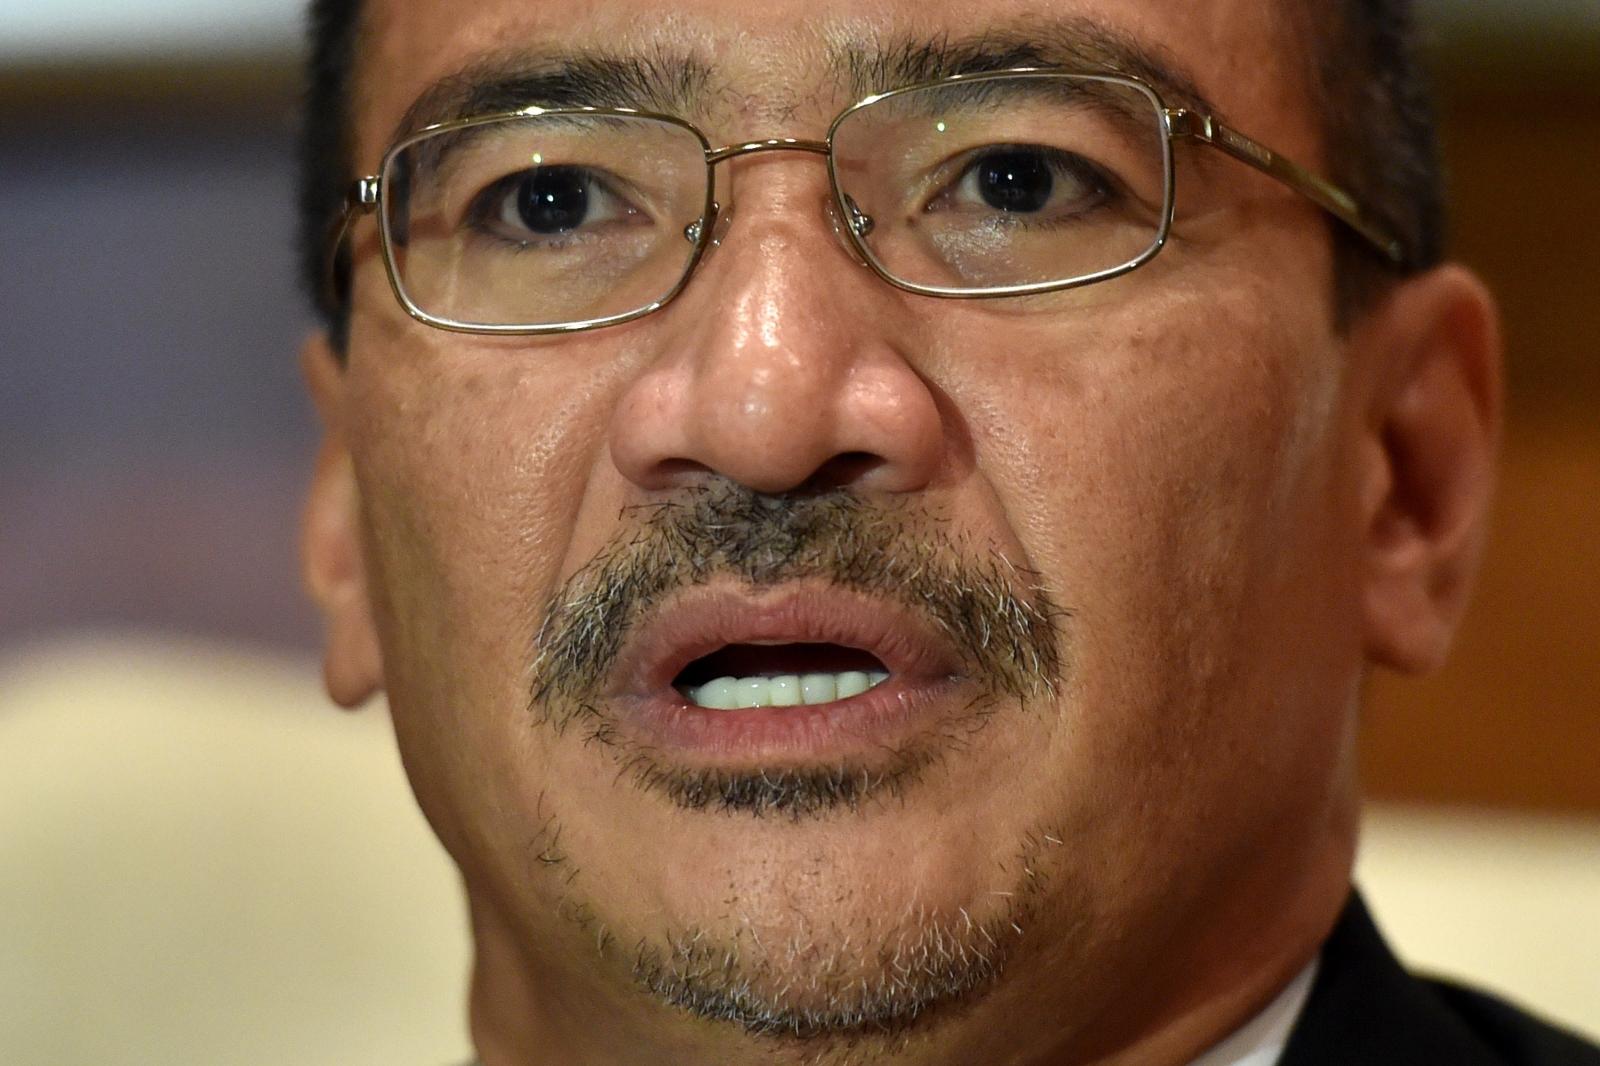 Hishammuddin Hussein almost certain MH370 shall be found, despite glaring lack of progress